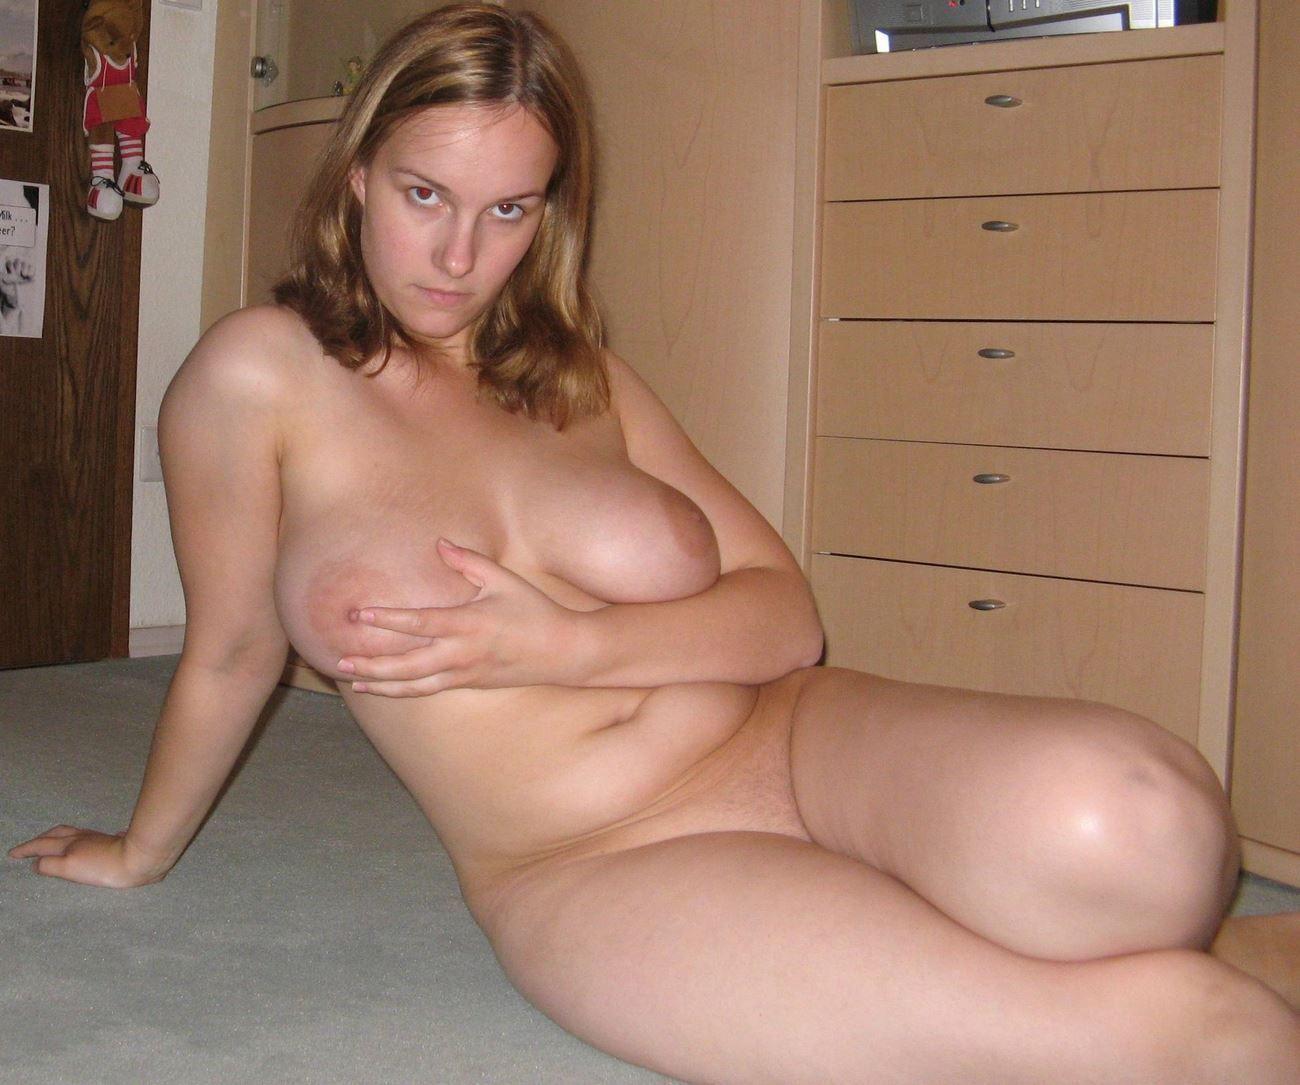 Anal masturbation pictures free